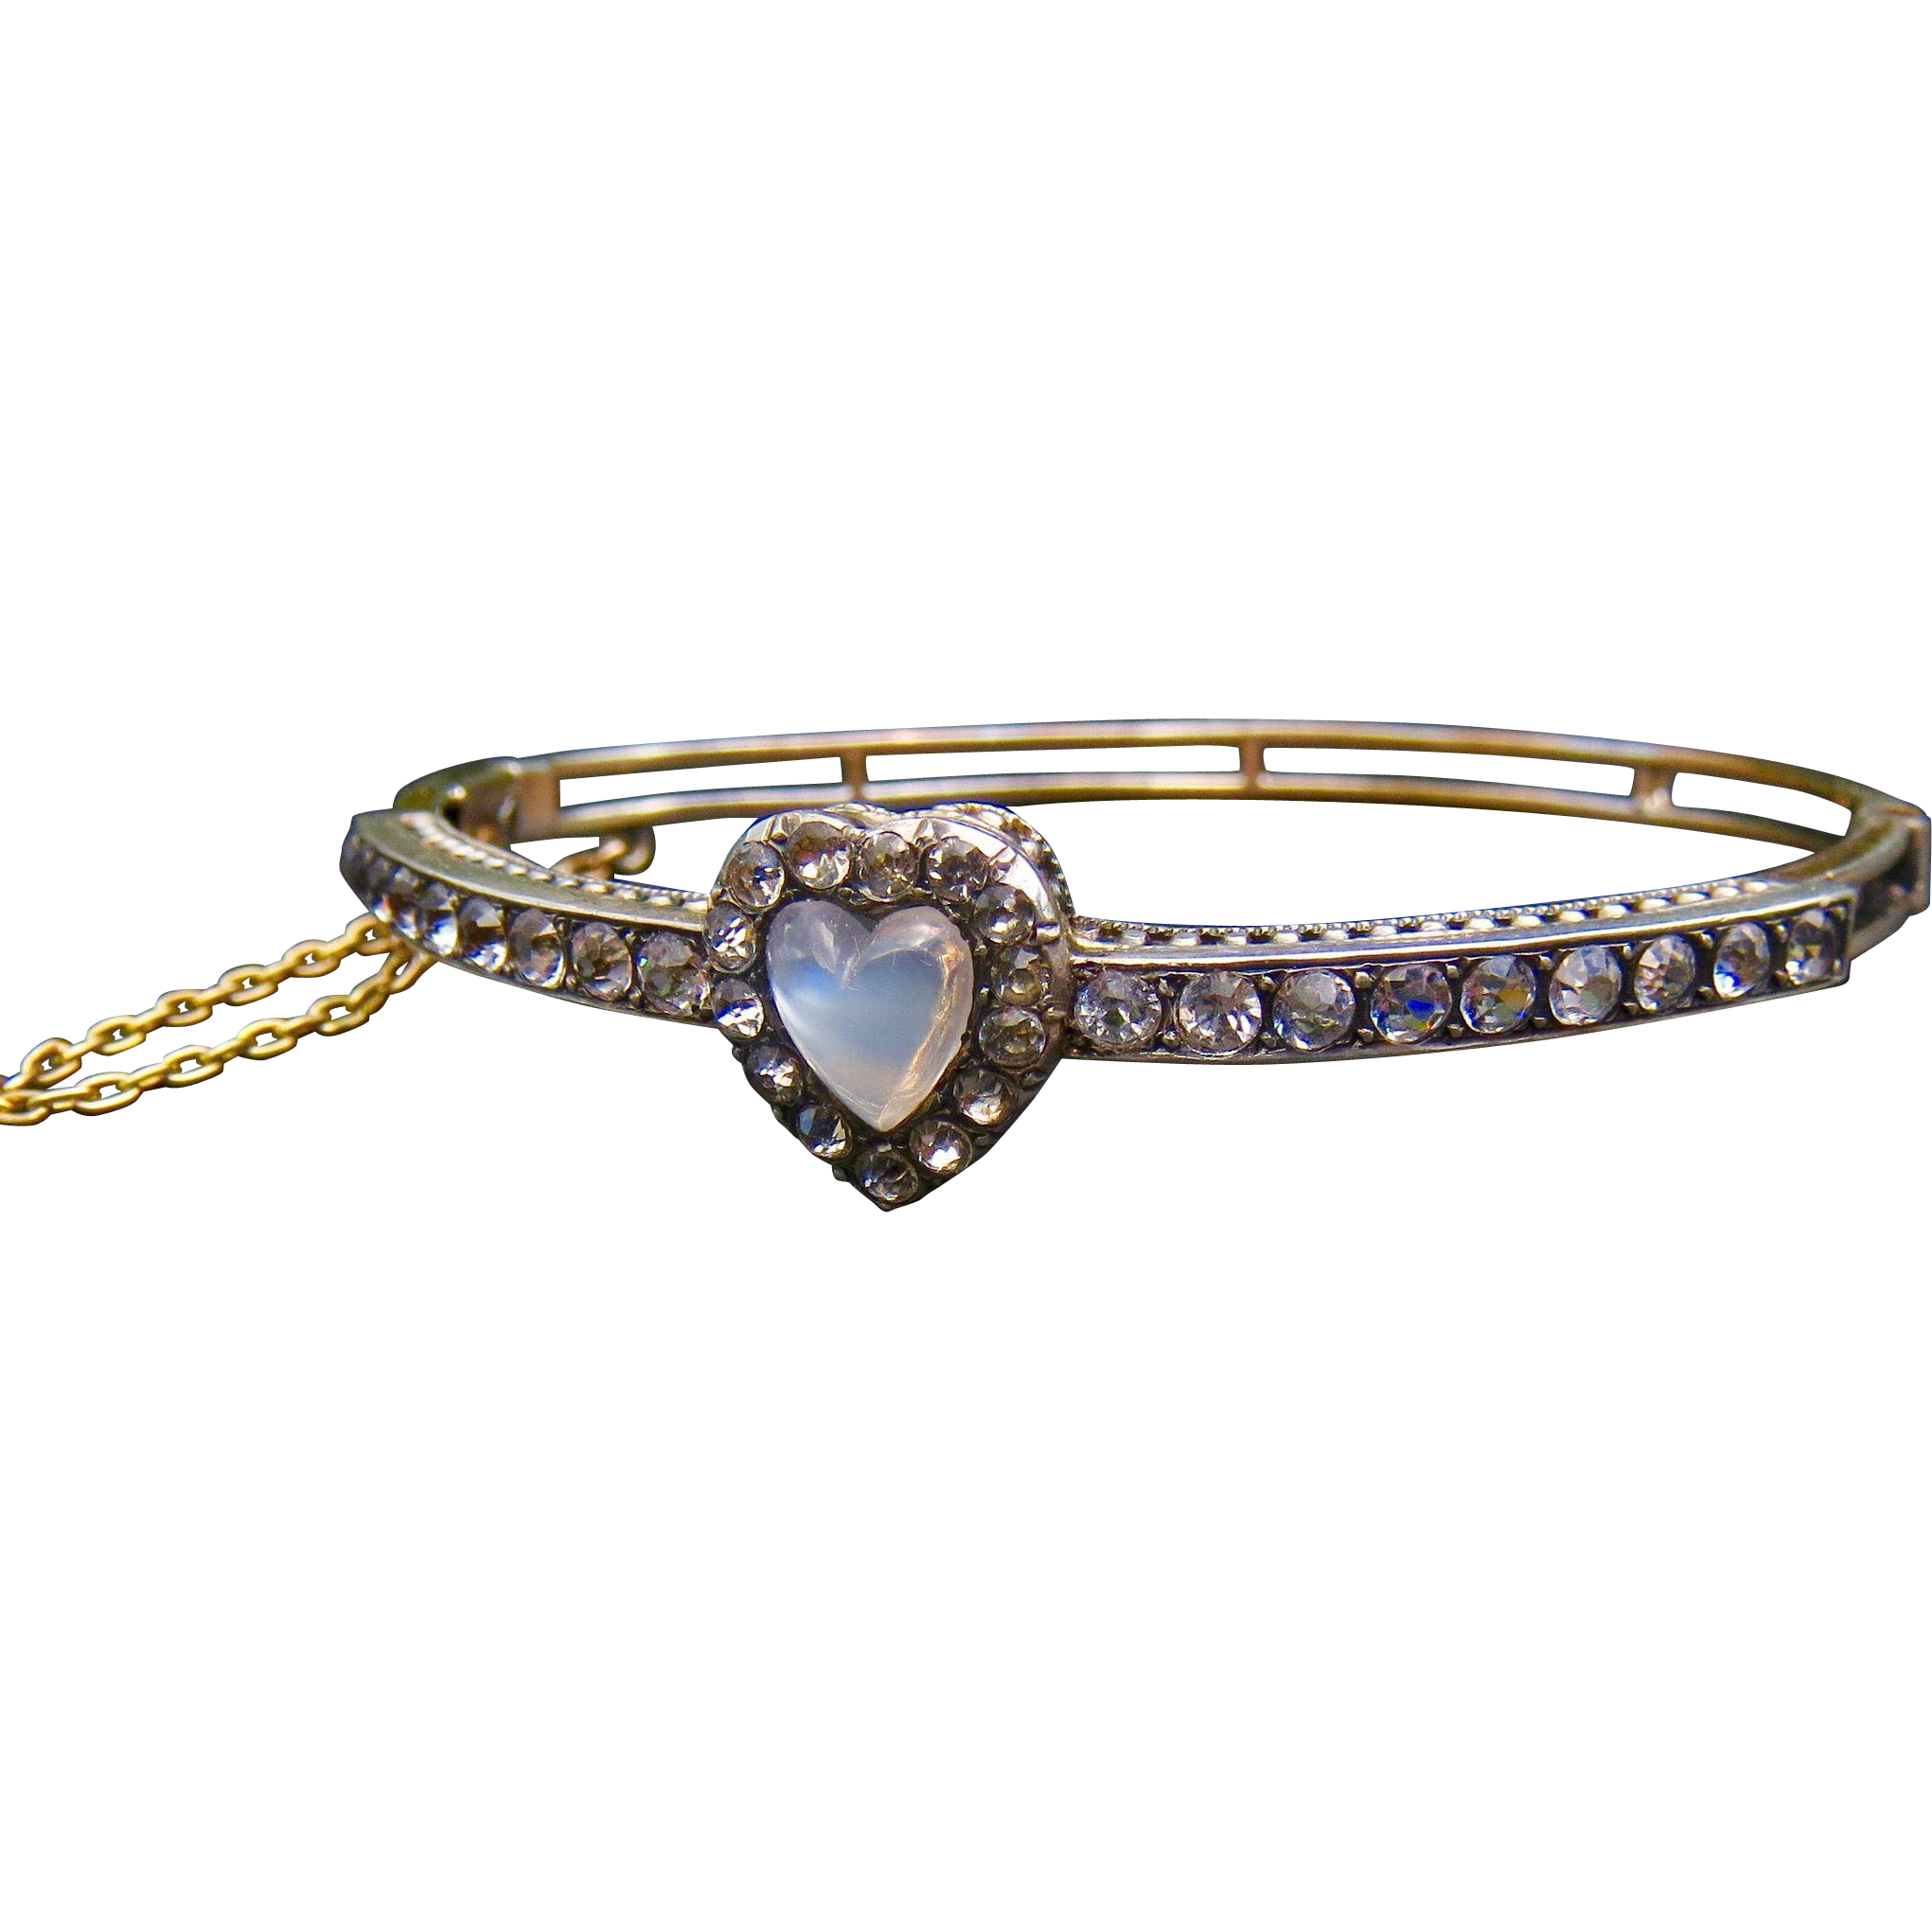 Rare Antique Fine Sterling Vermeil Paste and Moonstone Heart Bracelet - STUNNING!